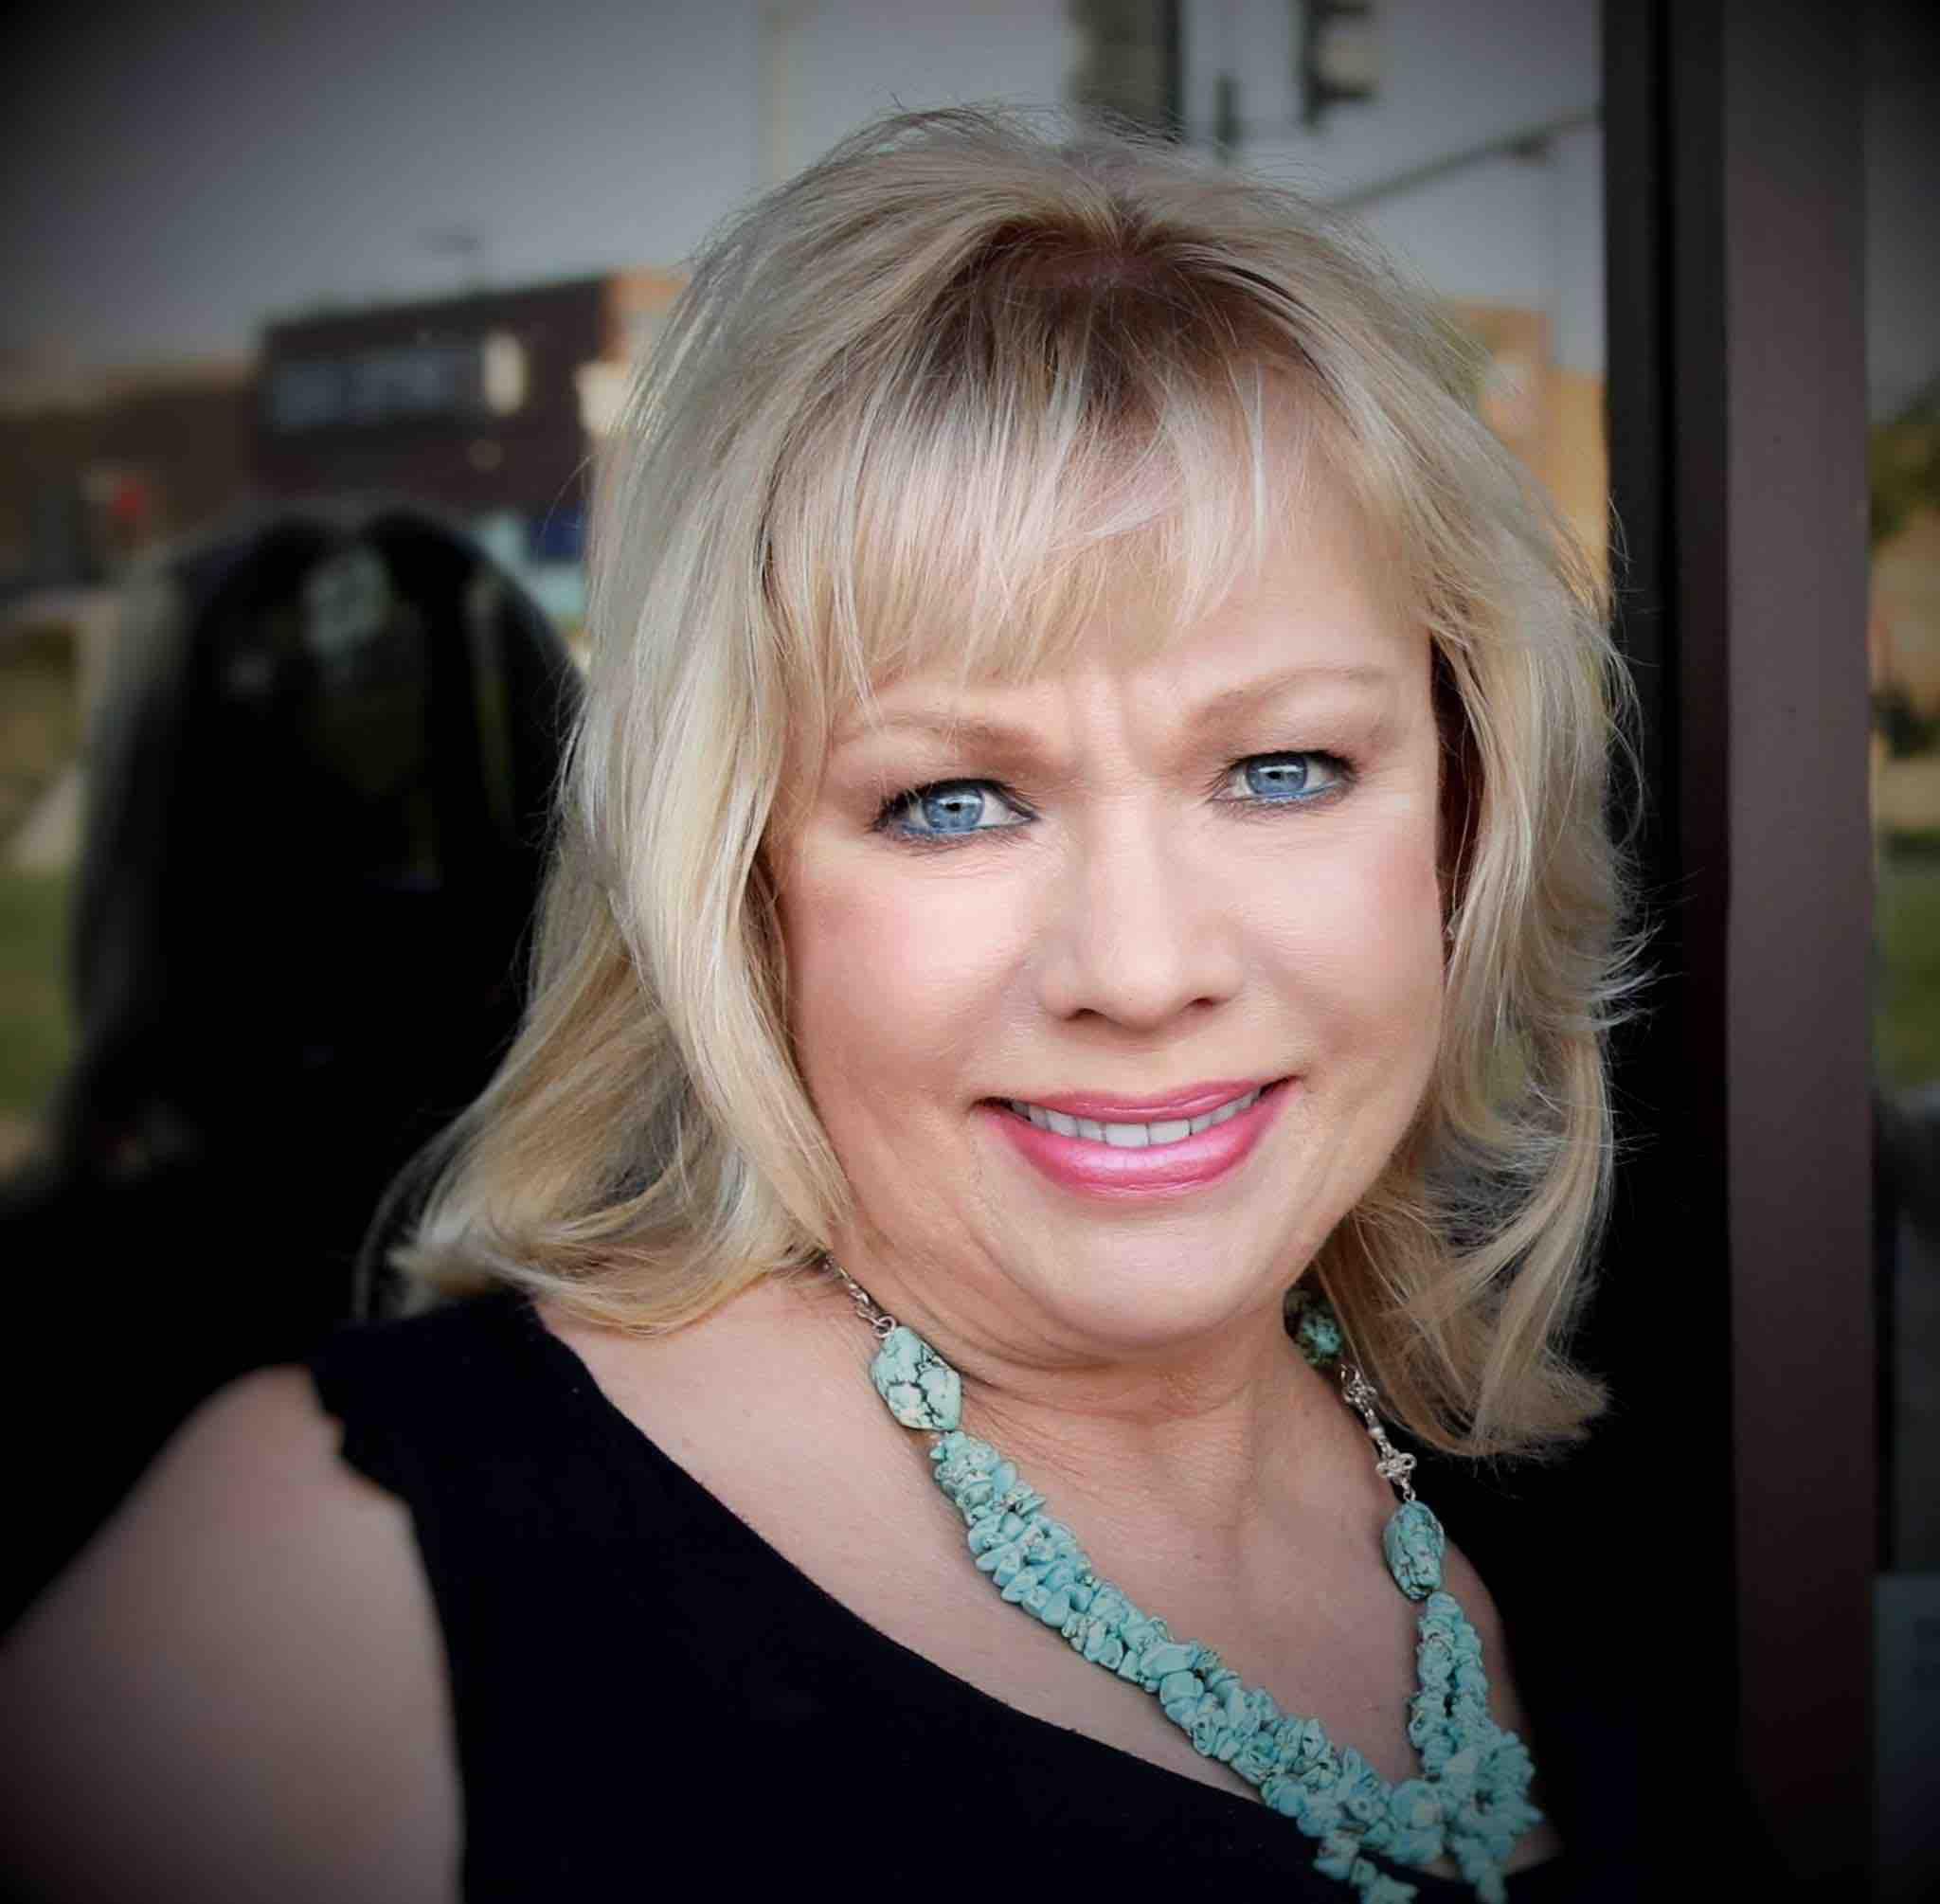 Linda Wunderlich testimonial for Wes Schaeffer professional sales trainer